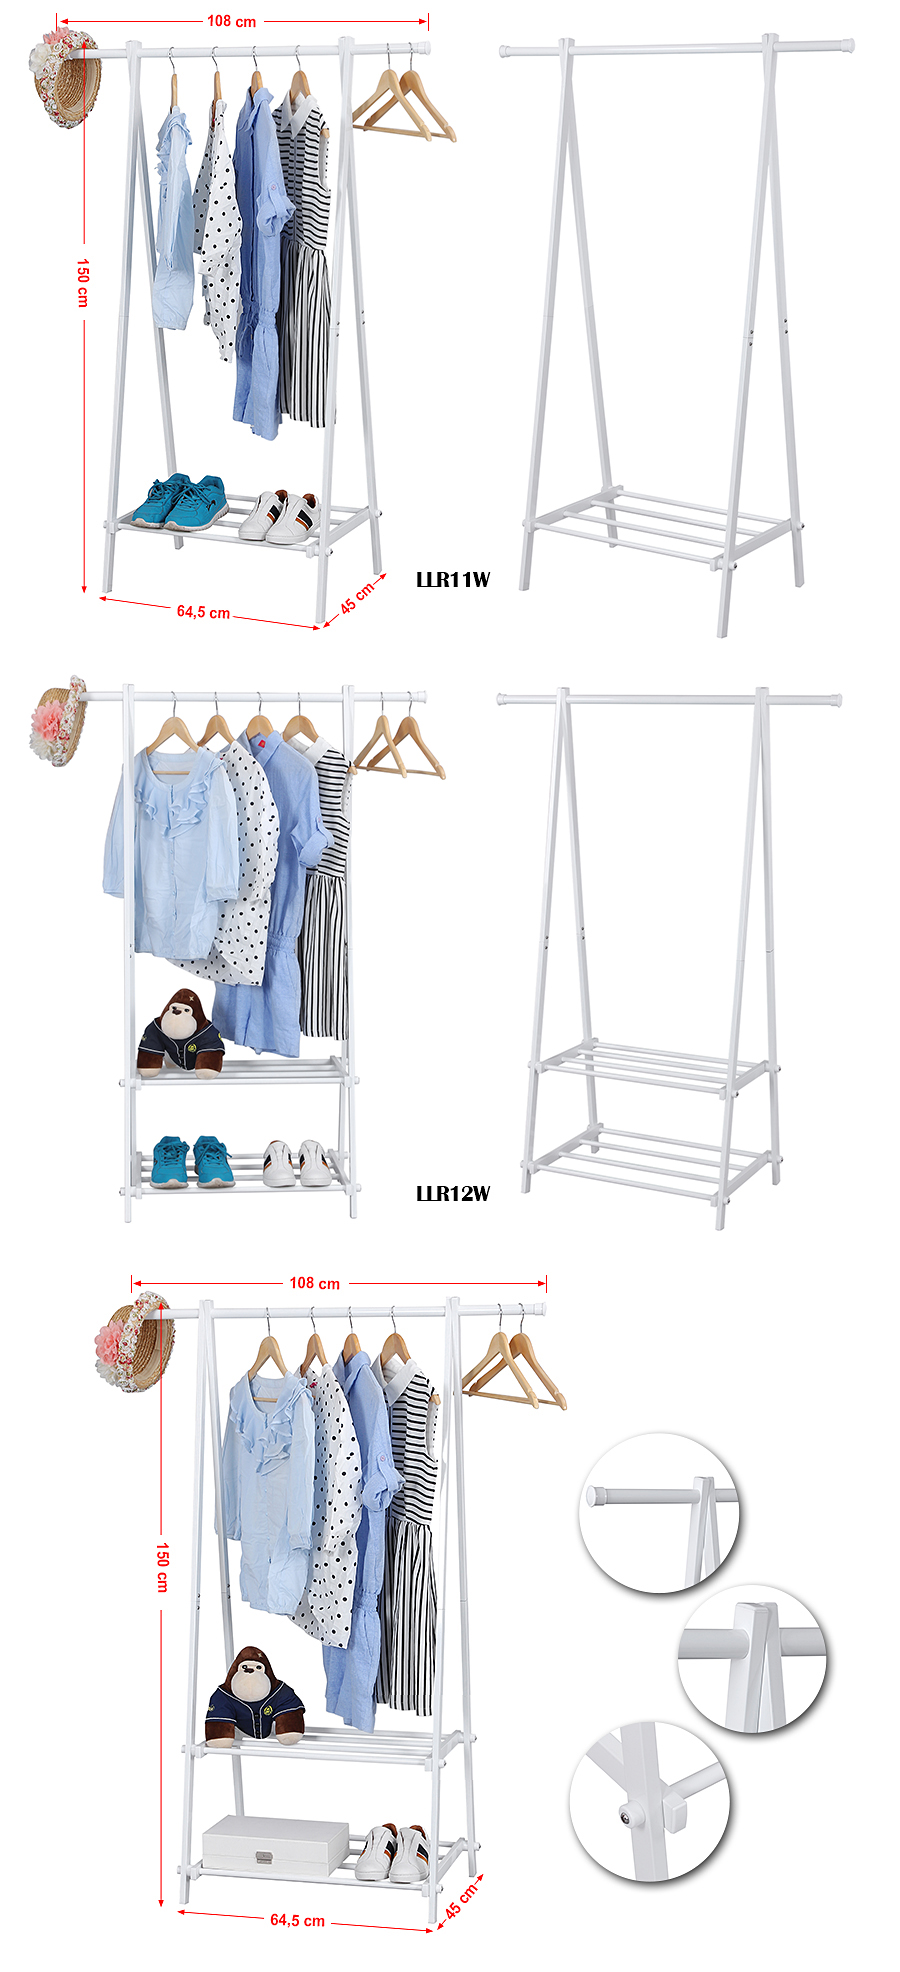 songmics metall kleiderst nder kleiderstange garderobenst nder st nder ebay. Black Bedroom Furniture Sets. Home Design Ideas